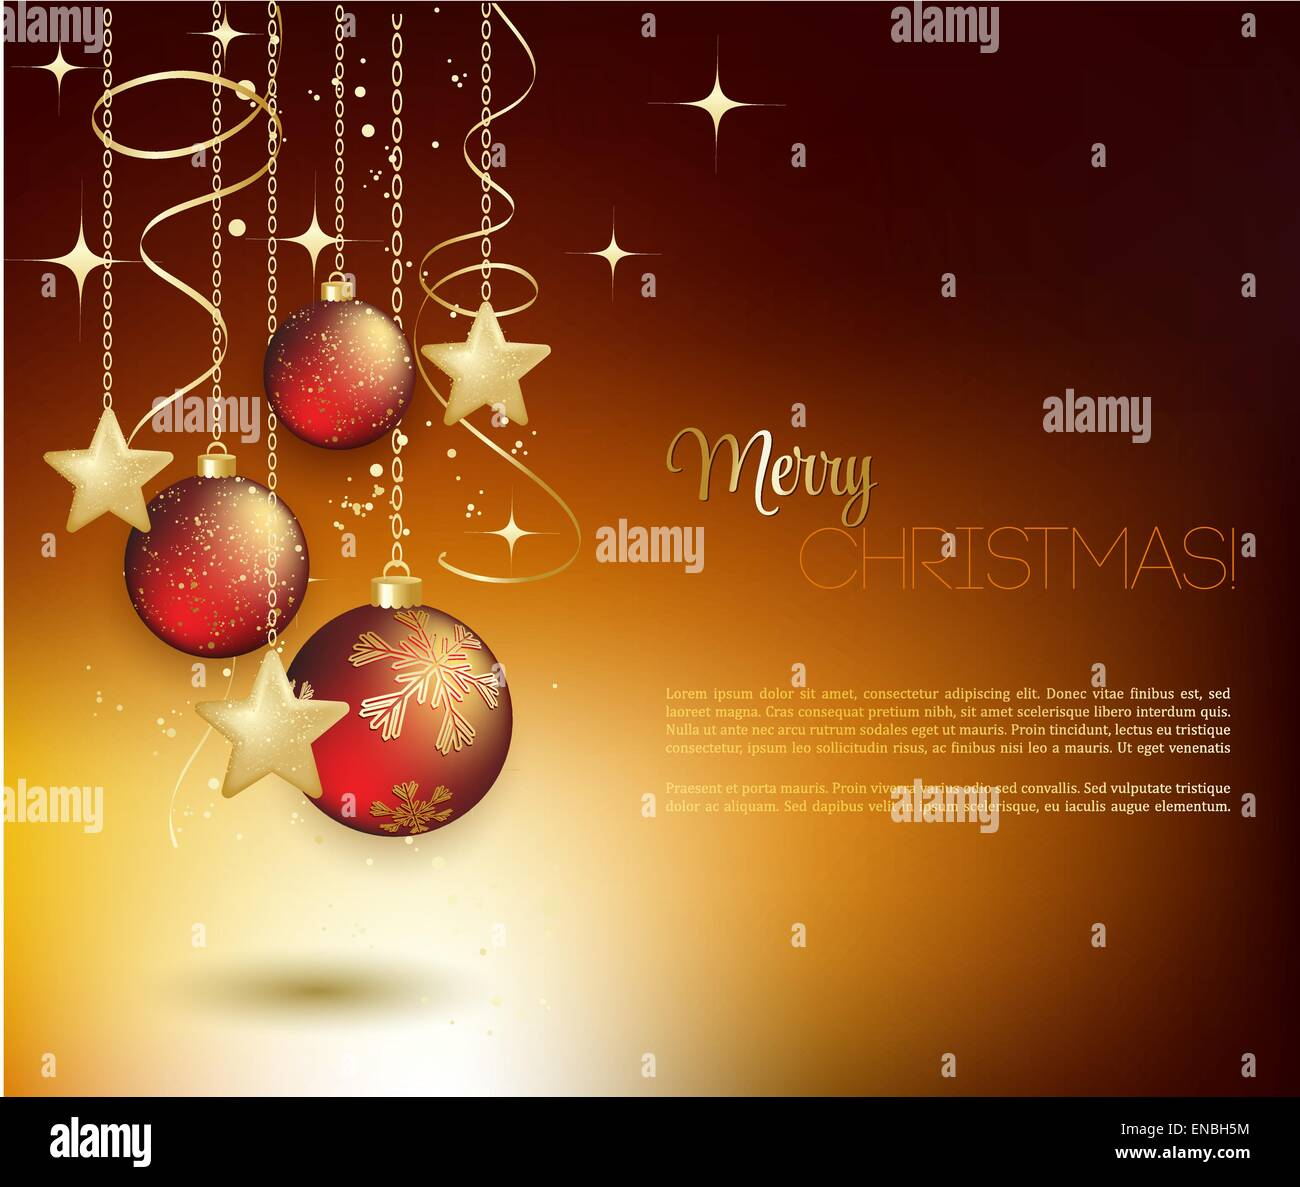 Joyeux Noel Techno.Joyeux Noel Carte Avec Babiole Rouge Vector Illustration